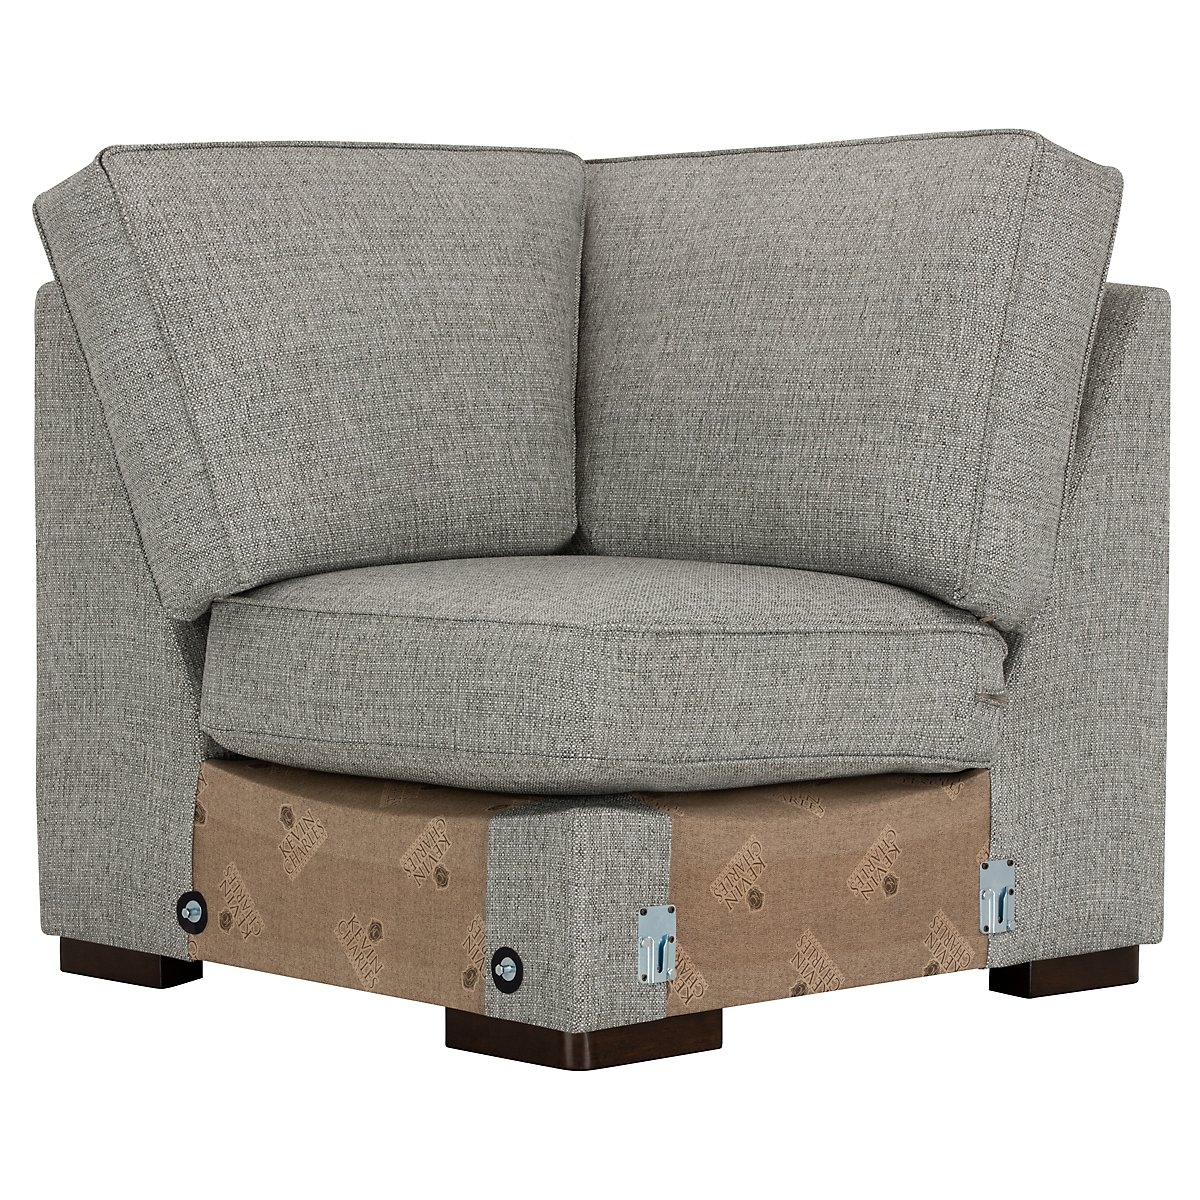 City Furniture Austin Gray Fabric Small Right Cuddler